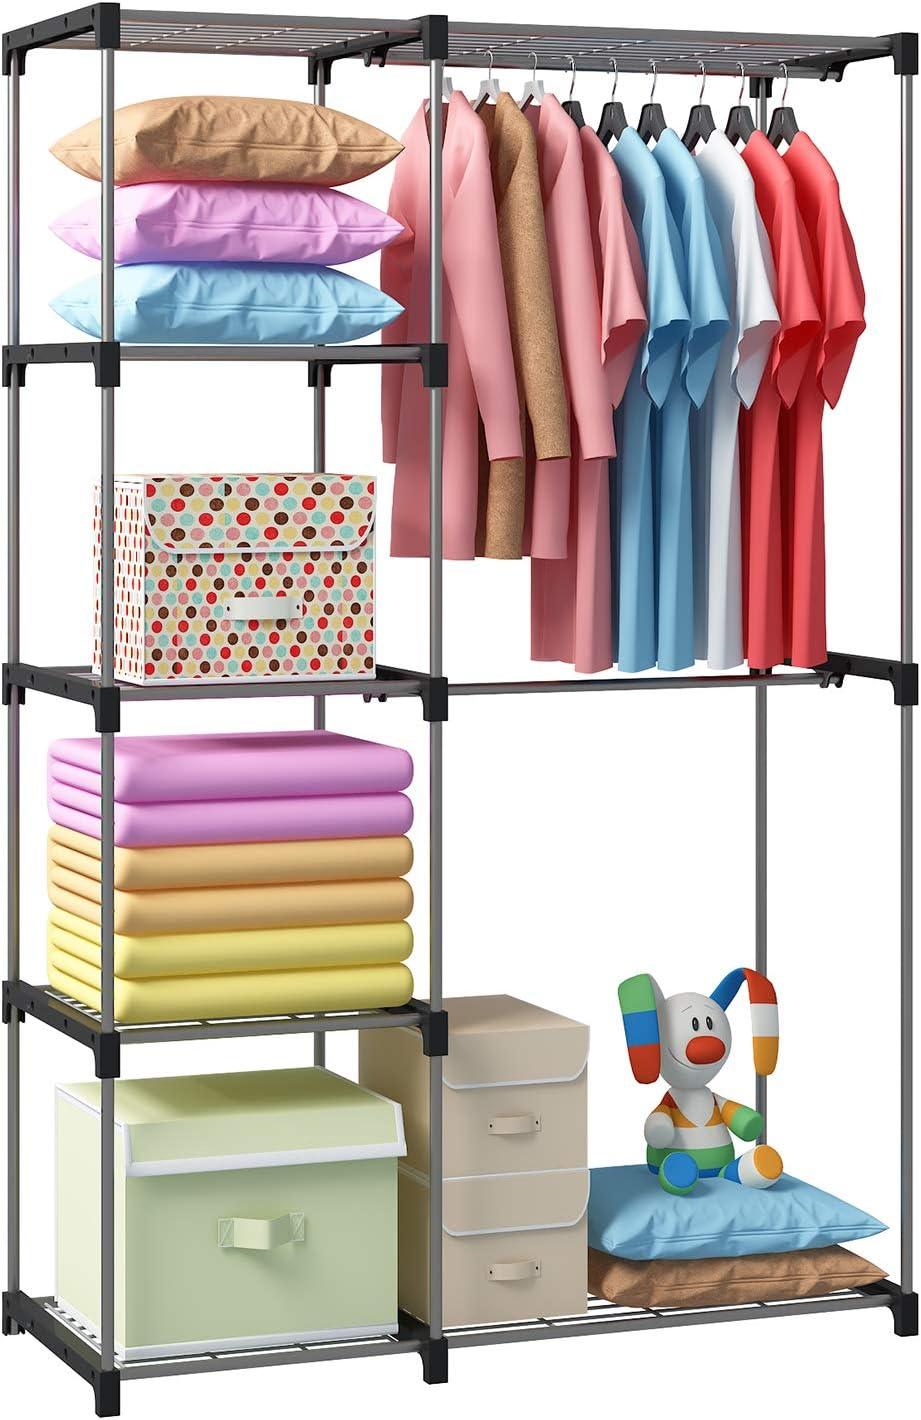 "GHQME Freestanding Double Rod Clothes Closet Organizer Storage Metal Heavy Duty Garment Rack Wardrobe with Wire Shelf for Bedroom Dorm Black, 44.5/"" x 18.1/"" x 68.1/"""